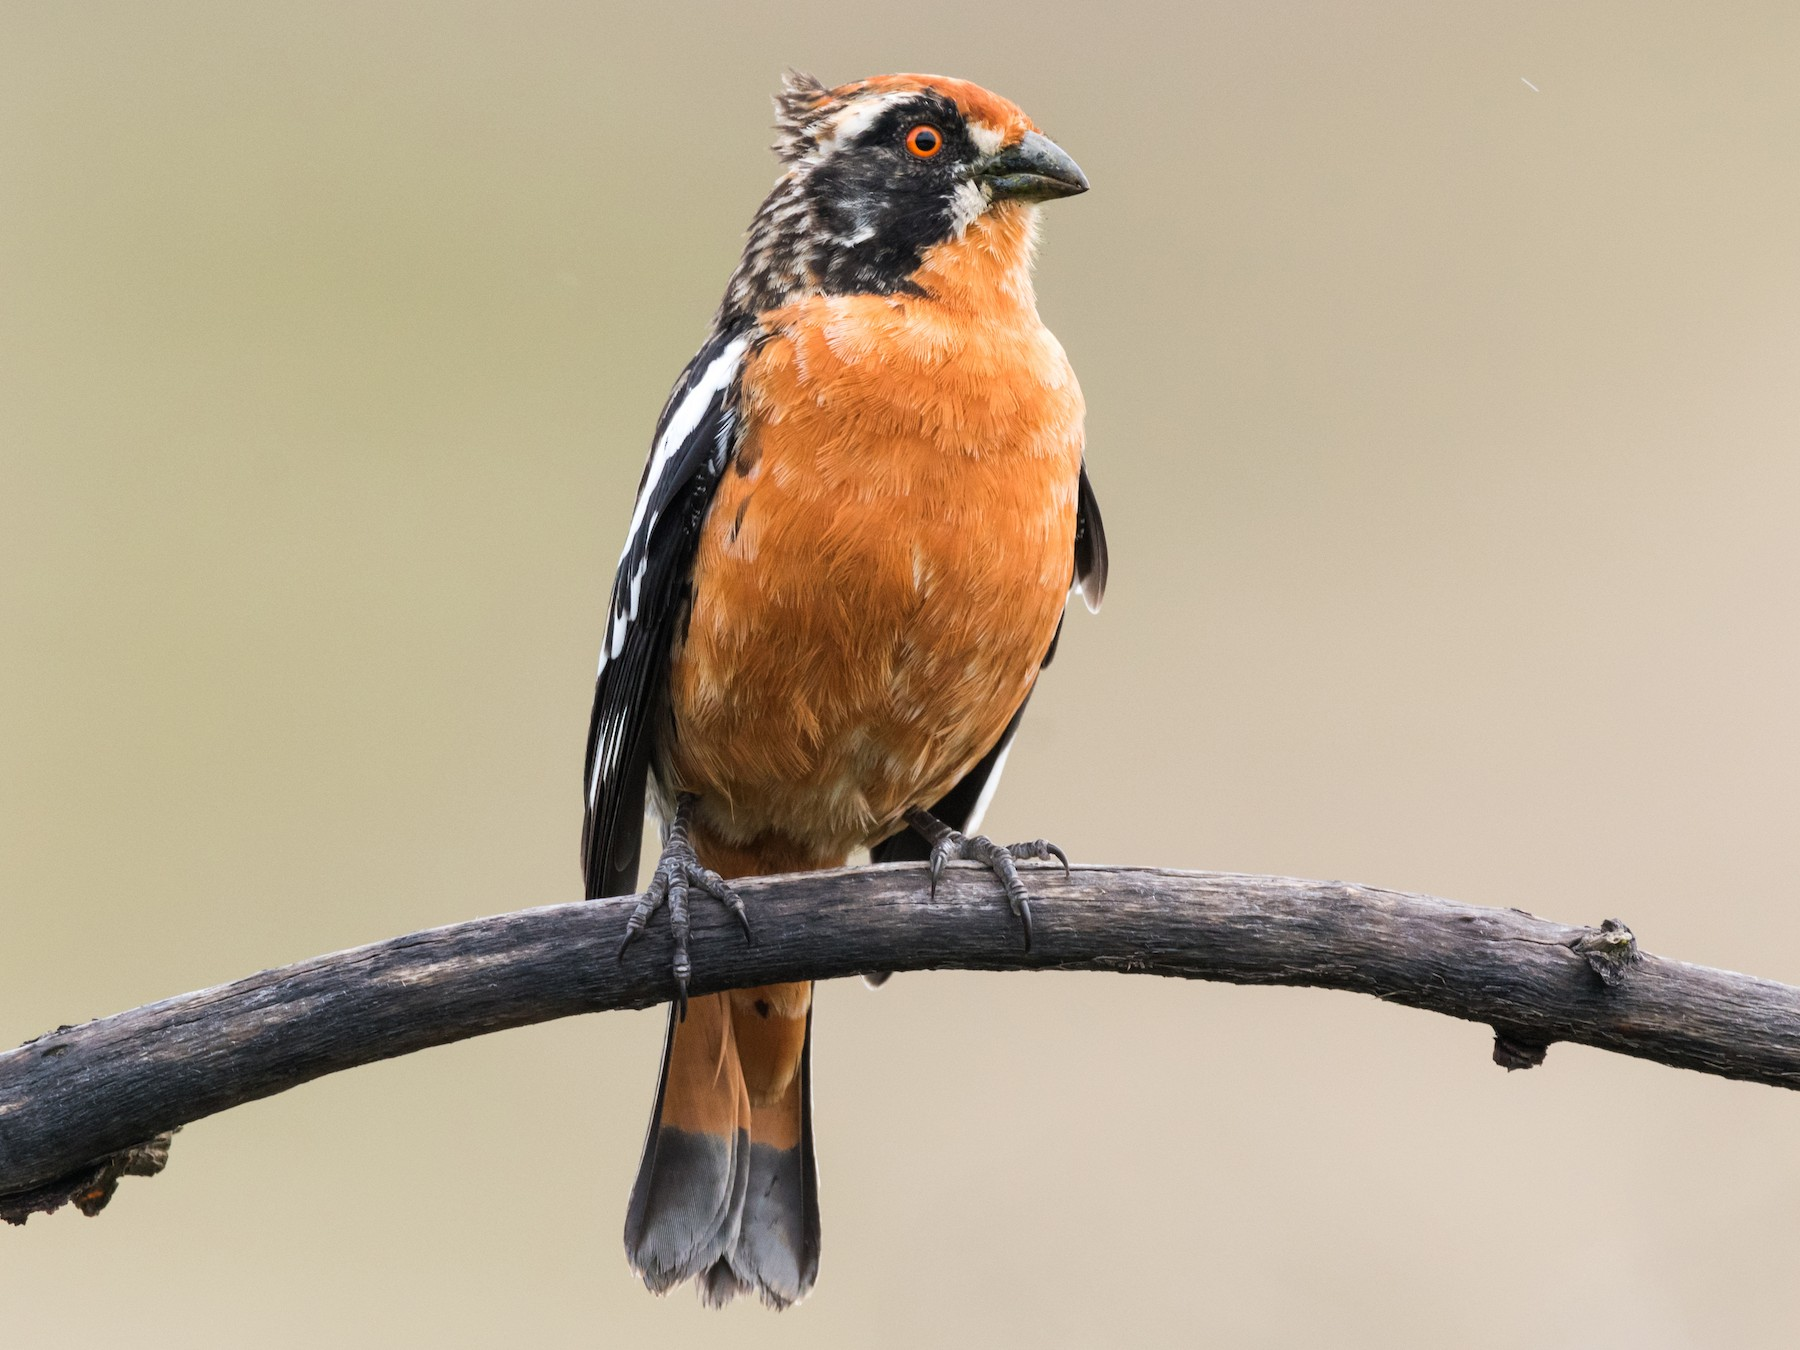 Rufous-tailed Plantcutter - Claudia Brasileiro